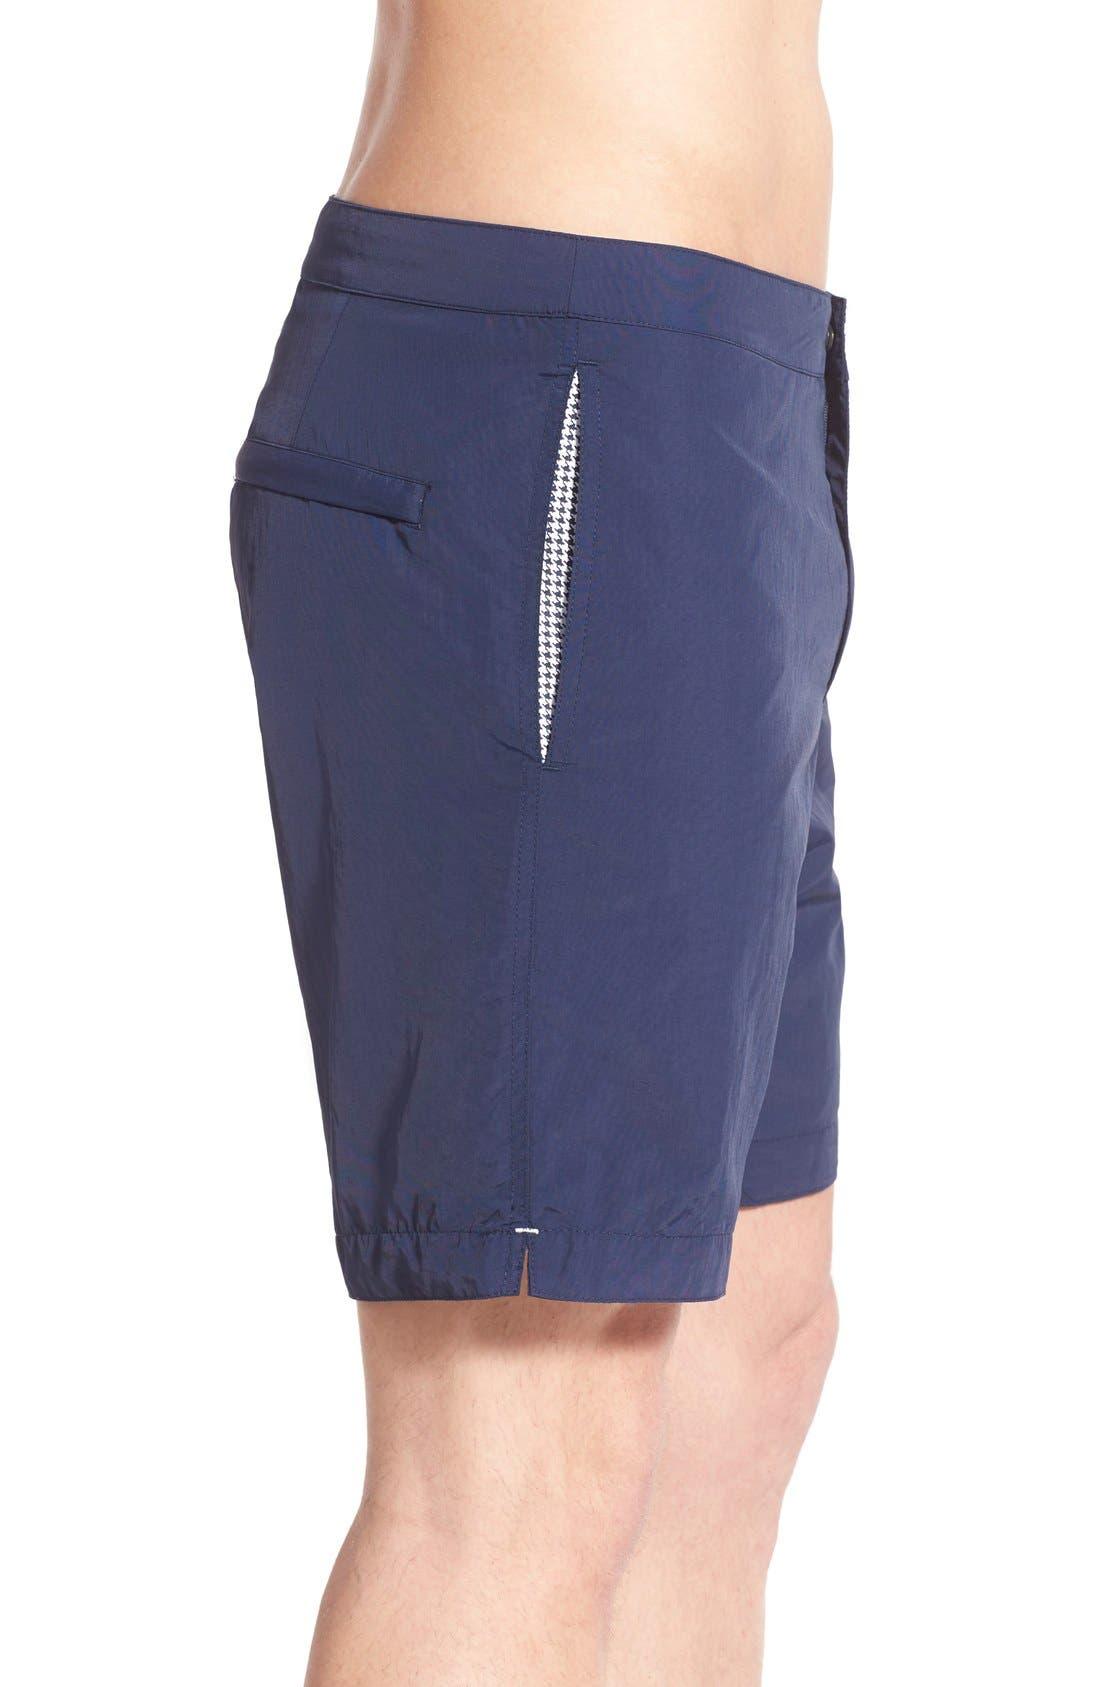 Aruba Tailored Fit 8.5 Inch Swim Trunks,                             Alternate thumbnail 8, color,                             415